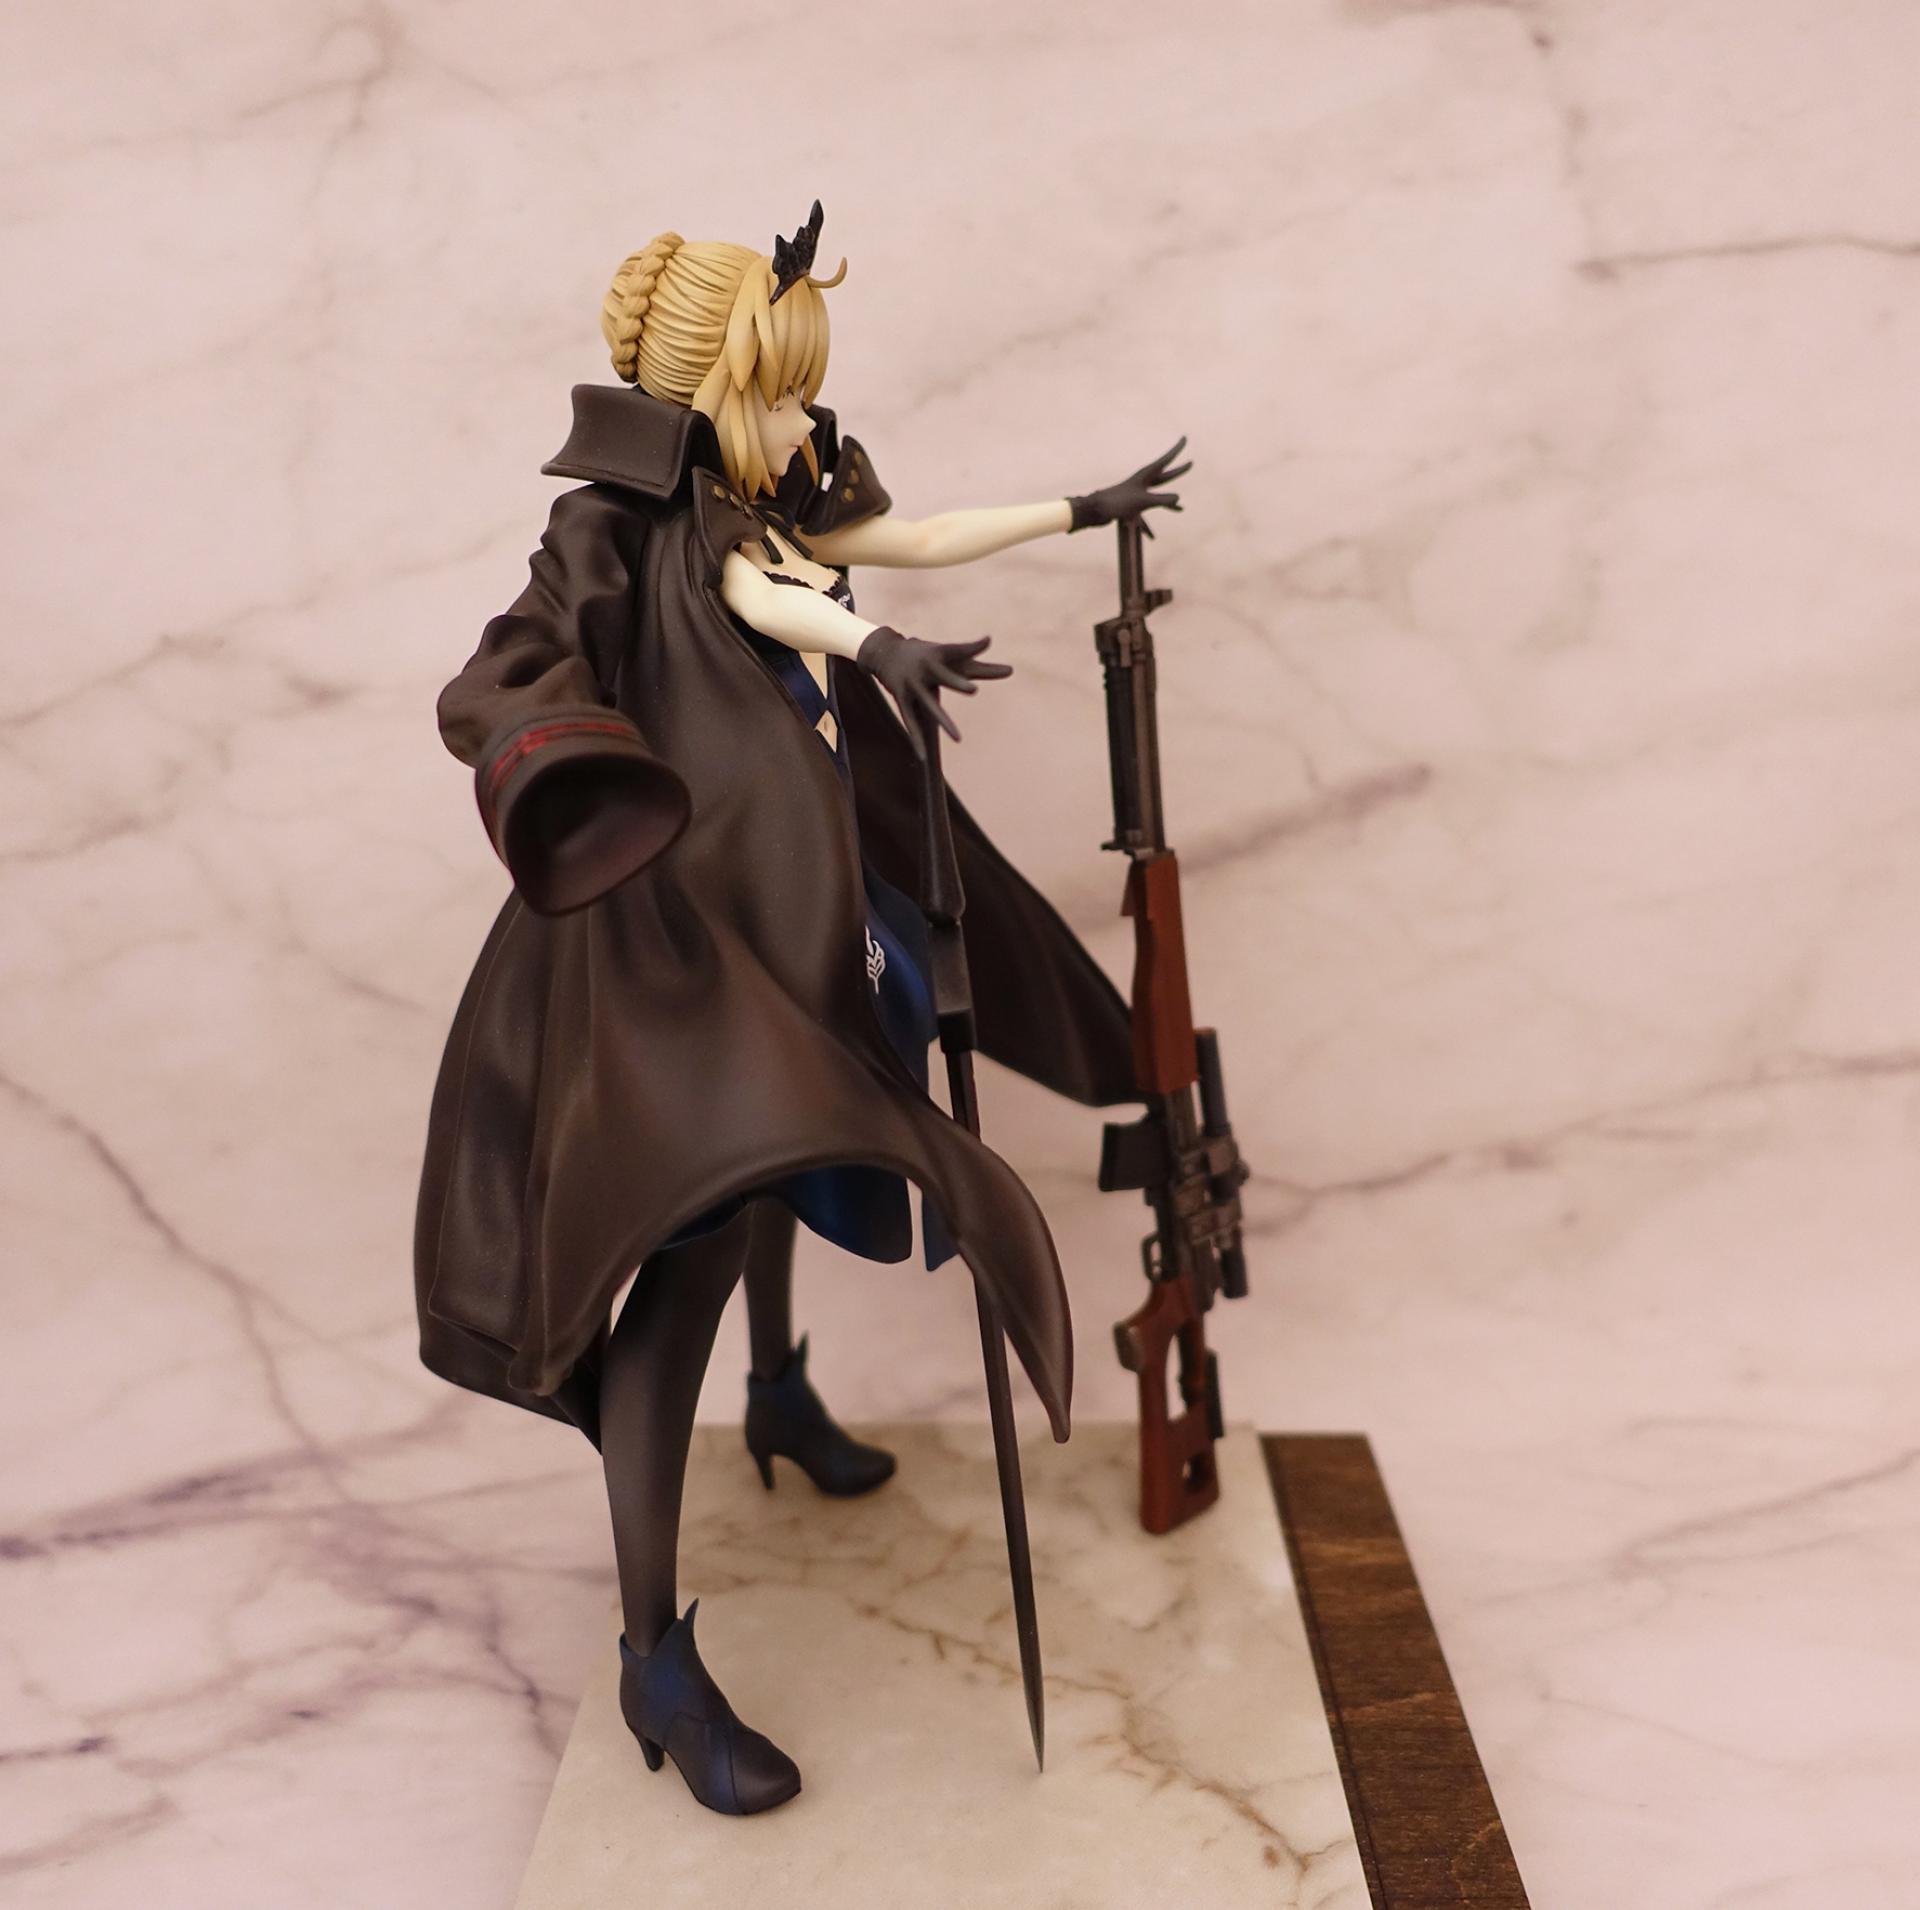 1/7 - Saber Alter - Rider - Fate/Grand Order